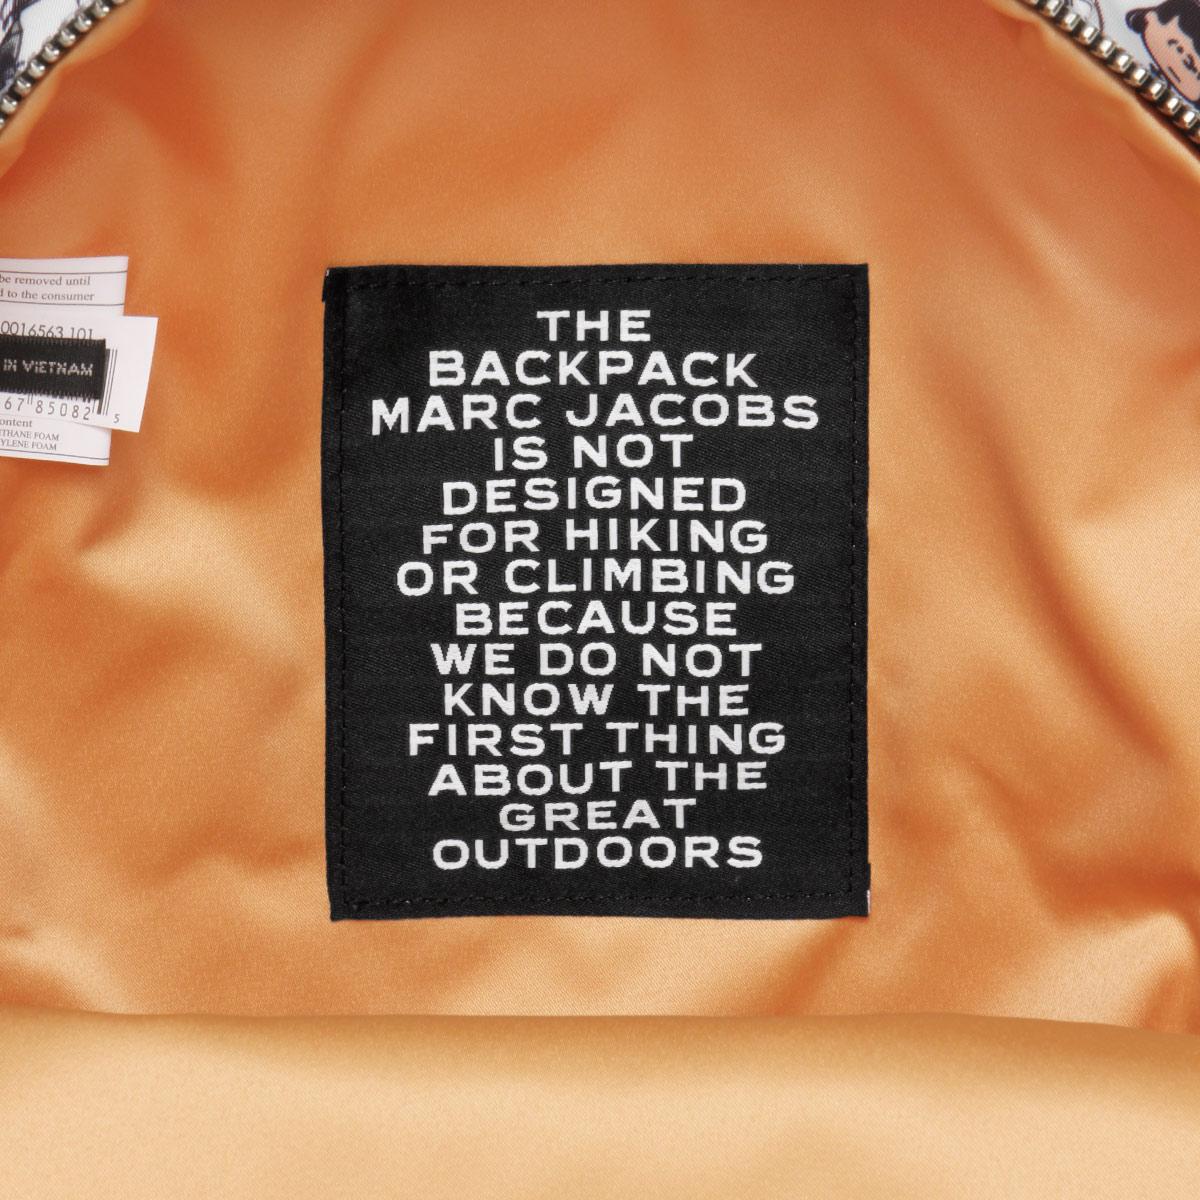 MARC JACOBS マーク ジェイコブス | バックパック ミディアム | PEANUTS ピーナッツ